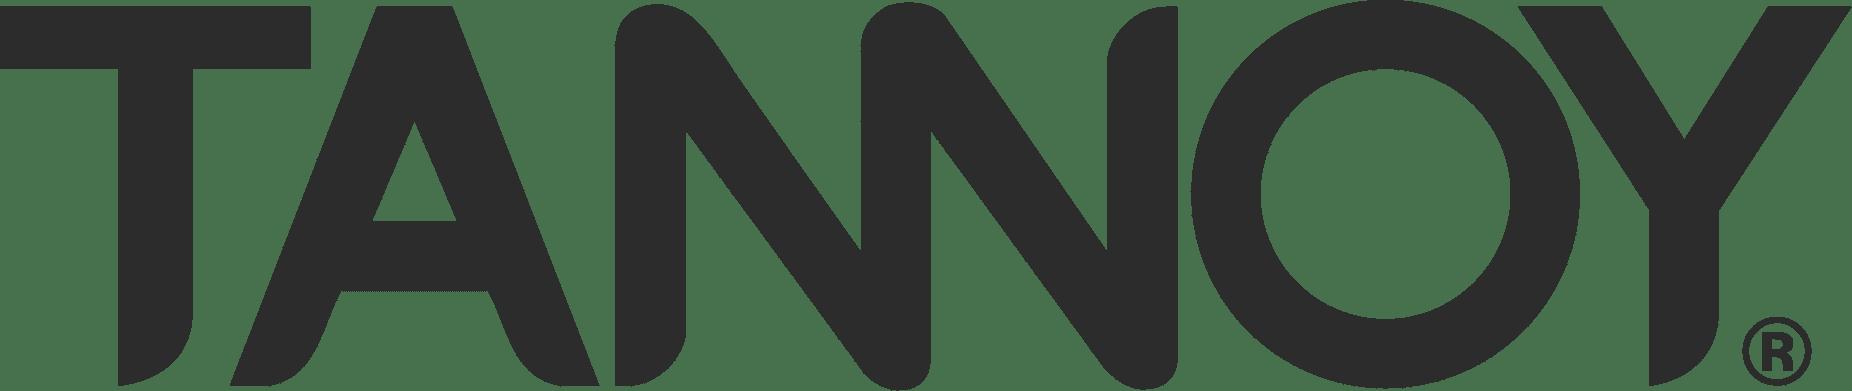 Tannoy_Logo